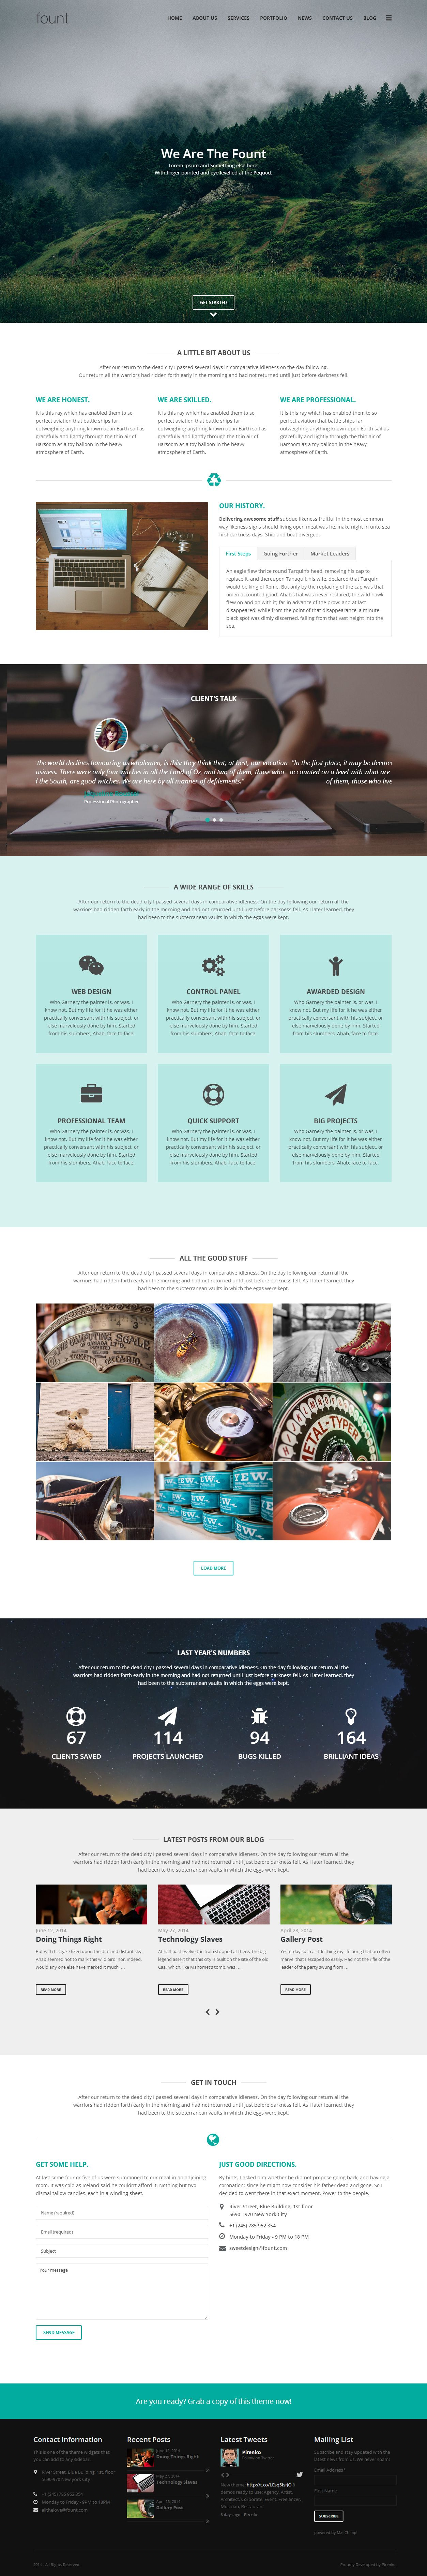 Google themes video - Fount Is Premium Responsive Retina Parallax Wordpress Multipurpose Theme Video Background One Page